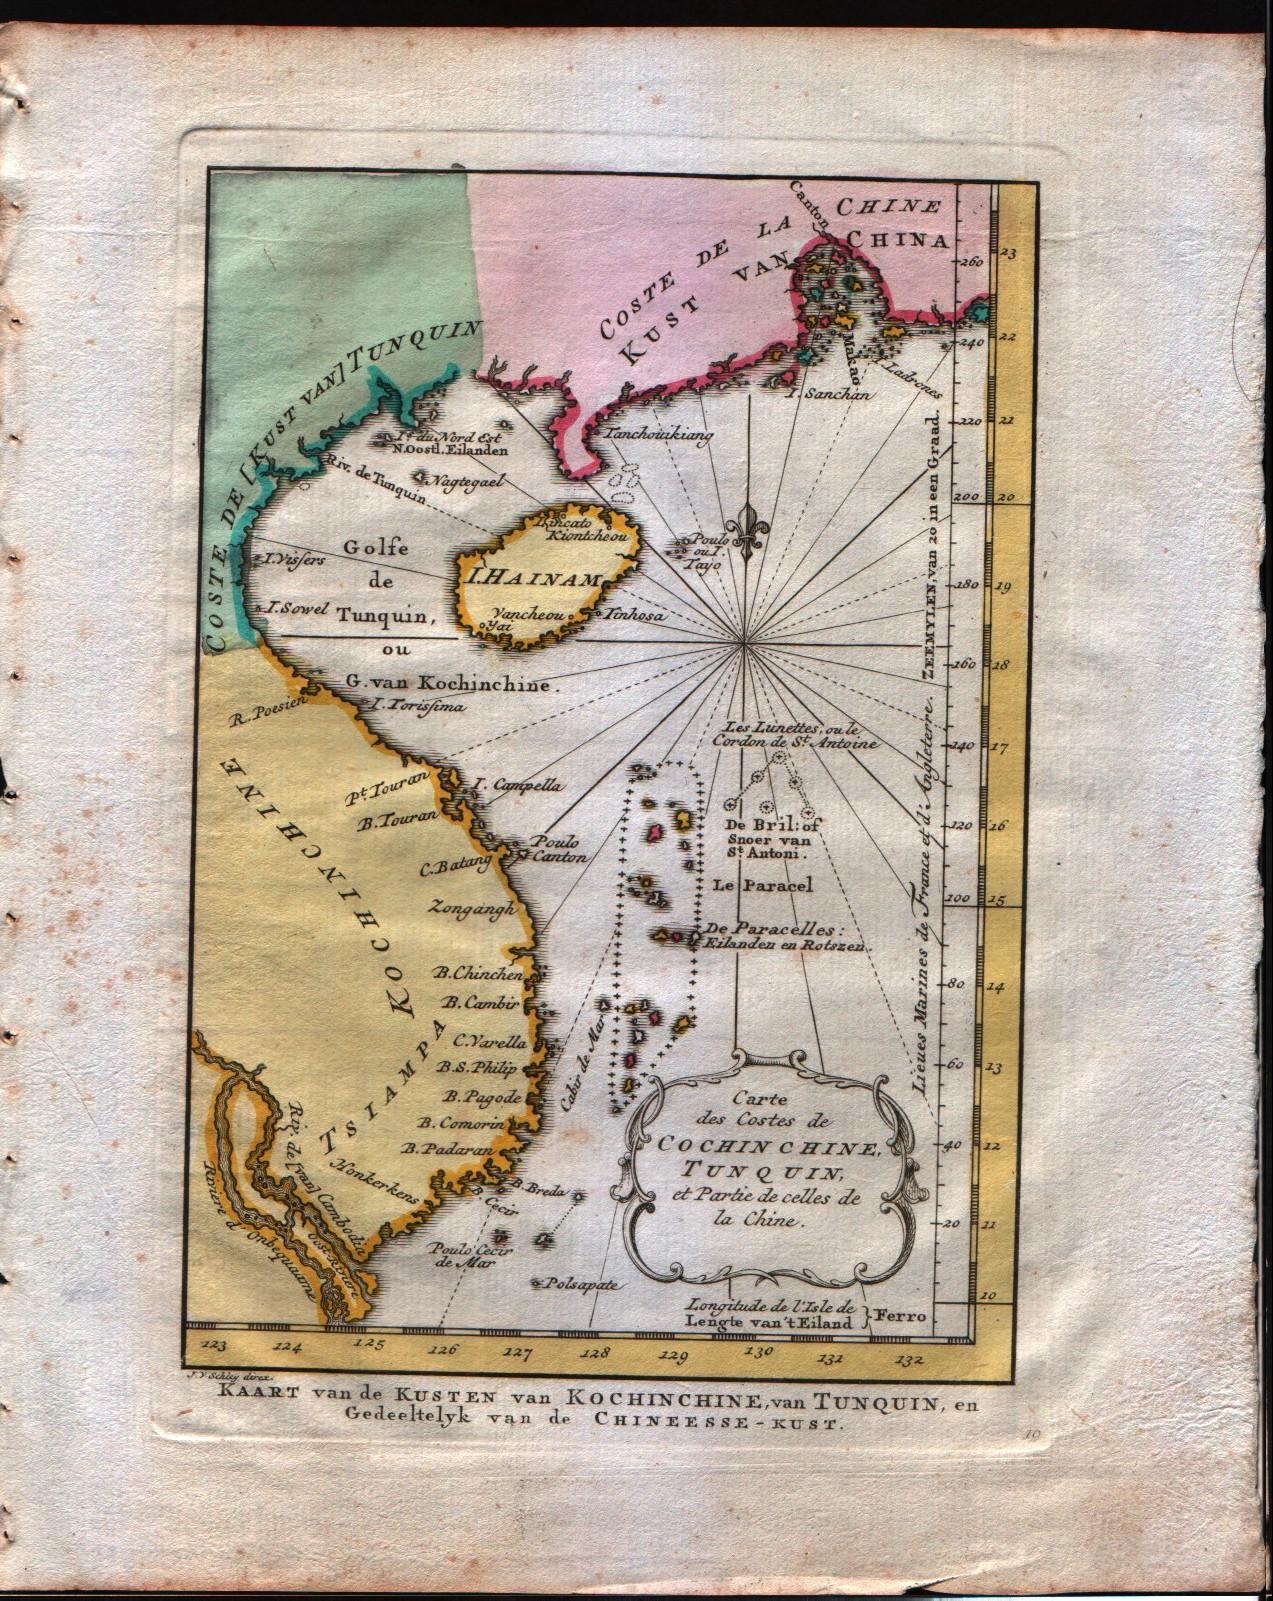 http://www.thetreasuremaps.com/maps/0269.jpg